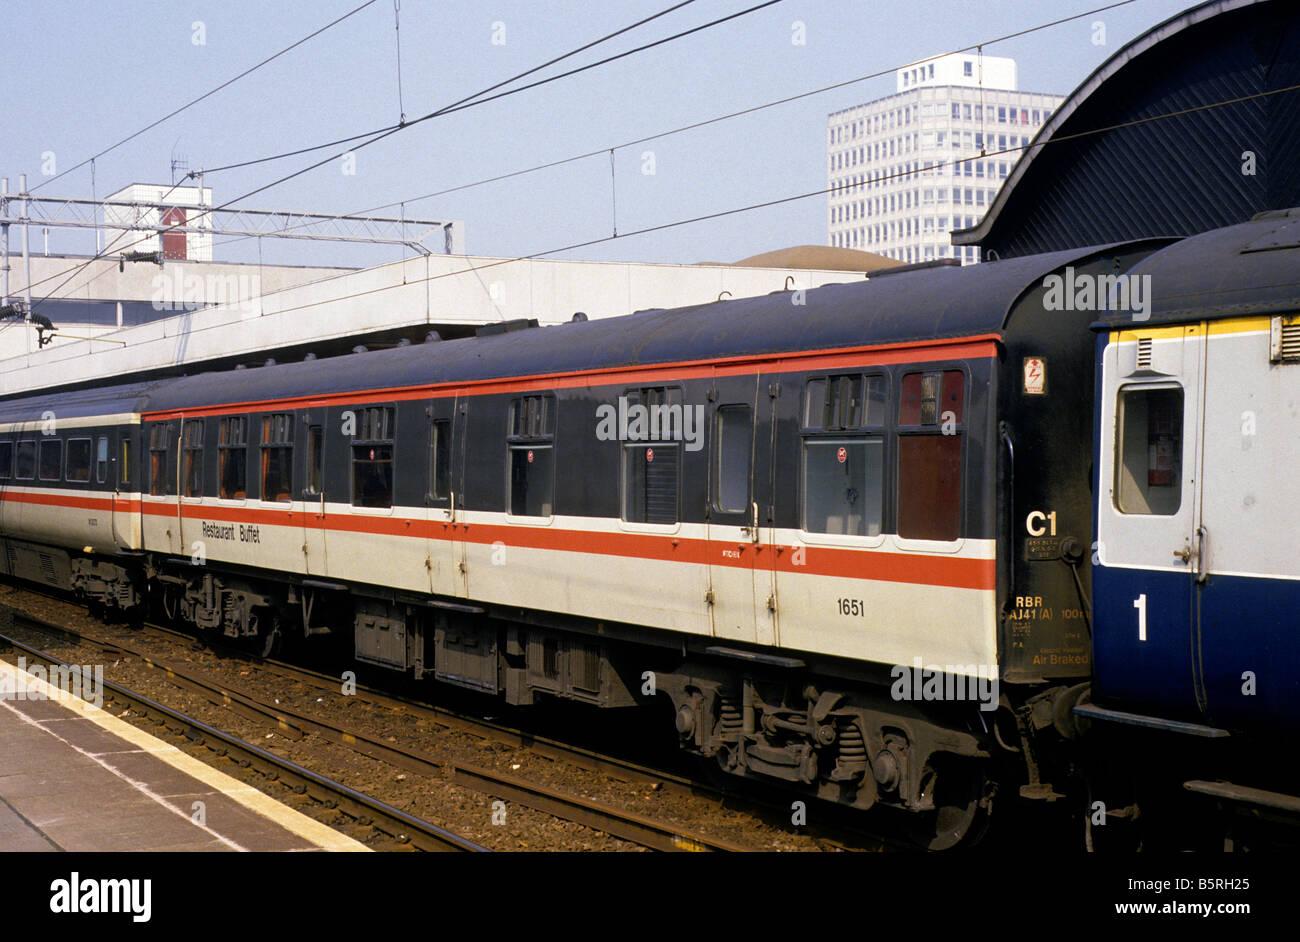 Railway Carriage Restaurant London